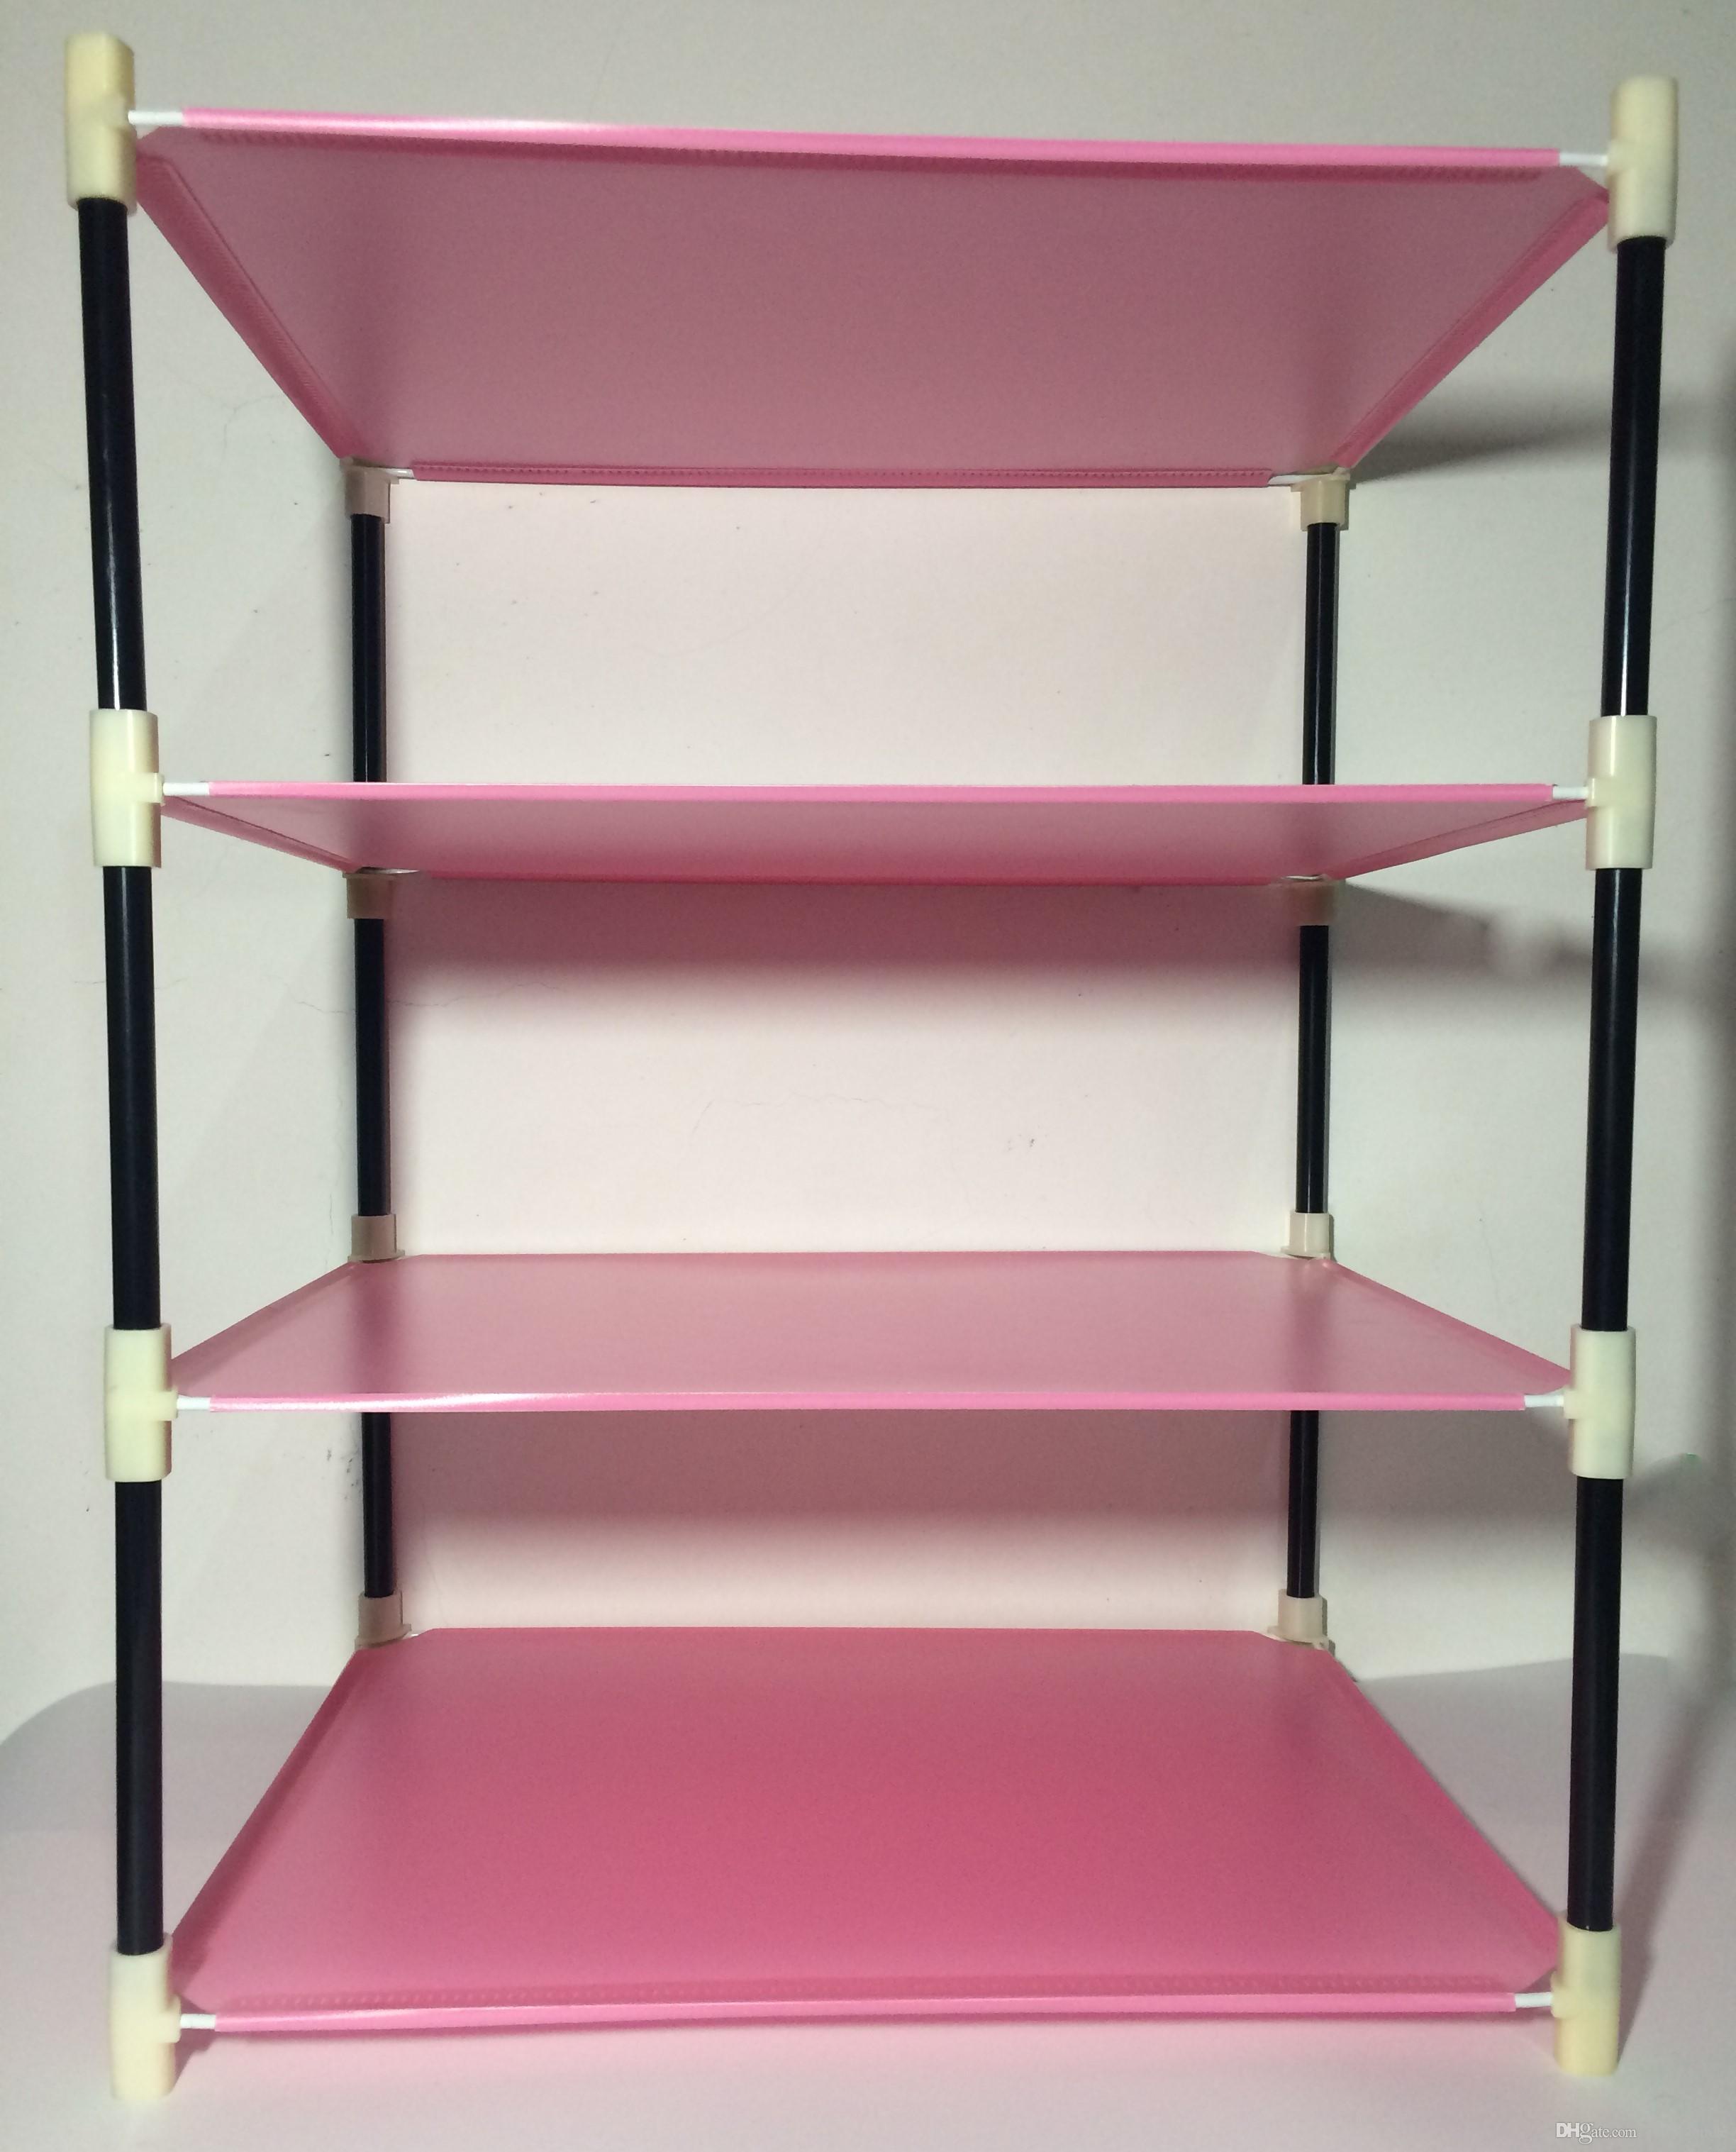 2017 2016 popular new living room bathroom storage rack stand storage rack storage holders racks 4 layers pink from china_uncle 403 dhgatecom - Magenta Bathroom 2016